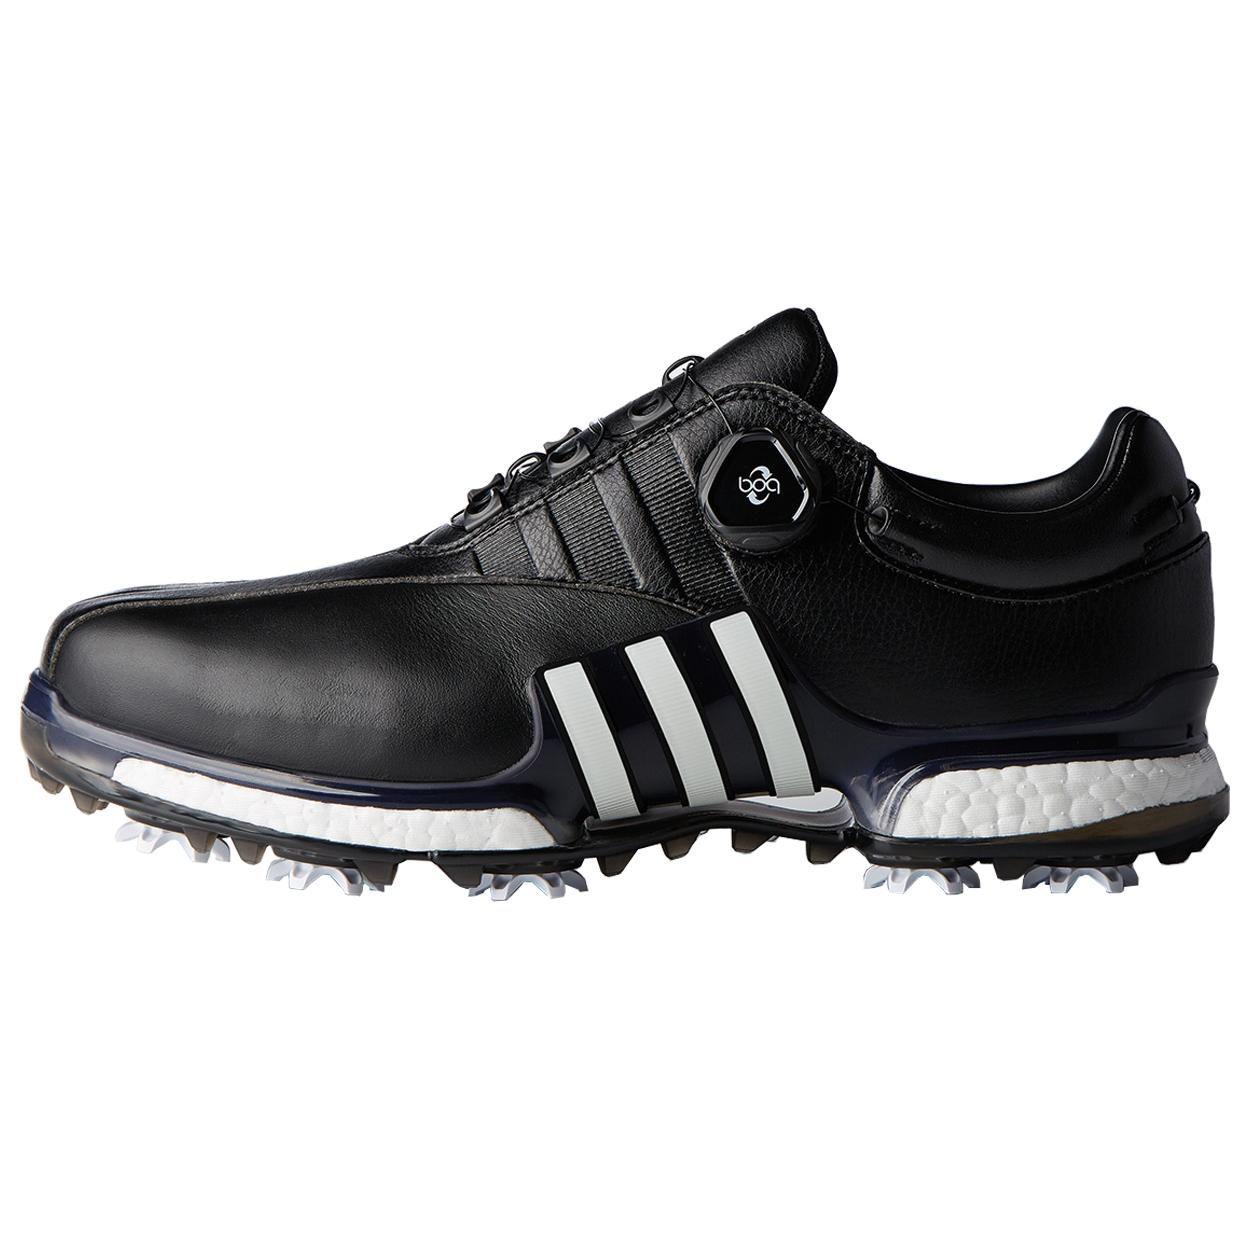 Adidas-Men-039-s-Tour-360-EQT-Boa-Golf-Shoes-Brand-New thumbnail 8